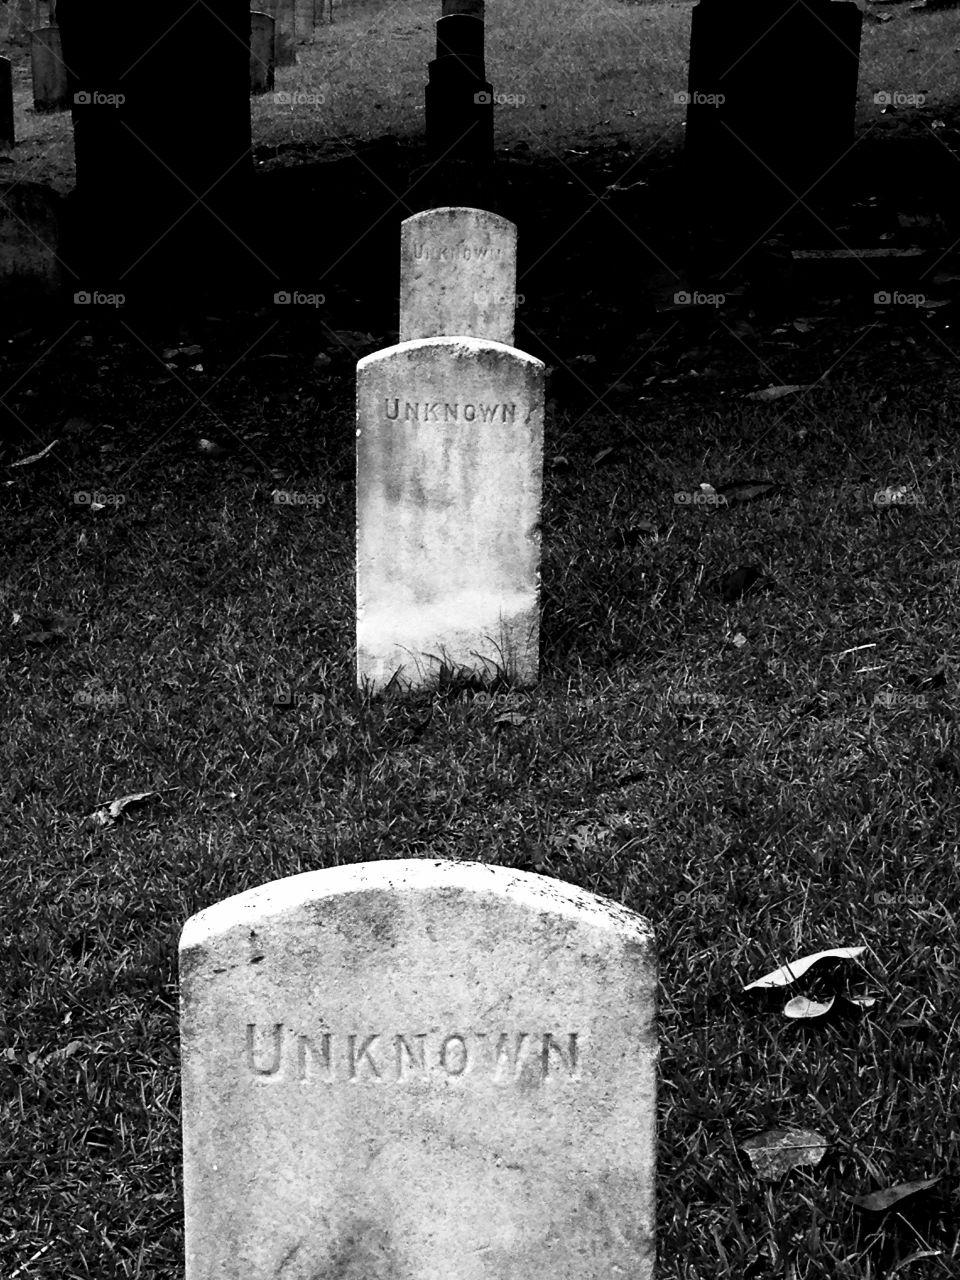 Unknown soldiers, graveyard, cemetery